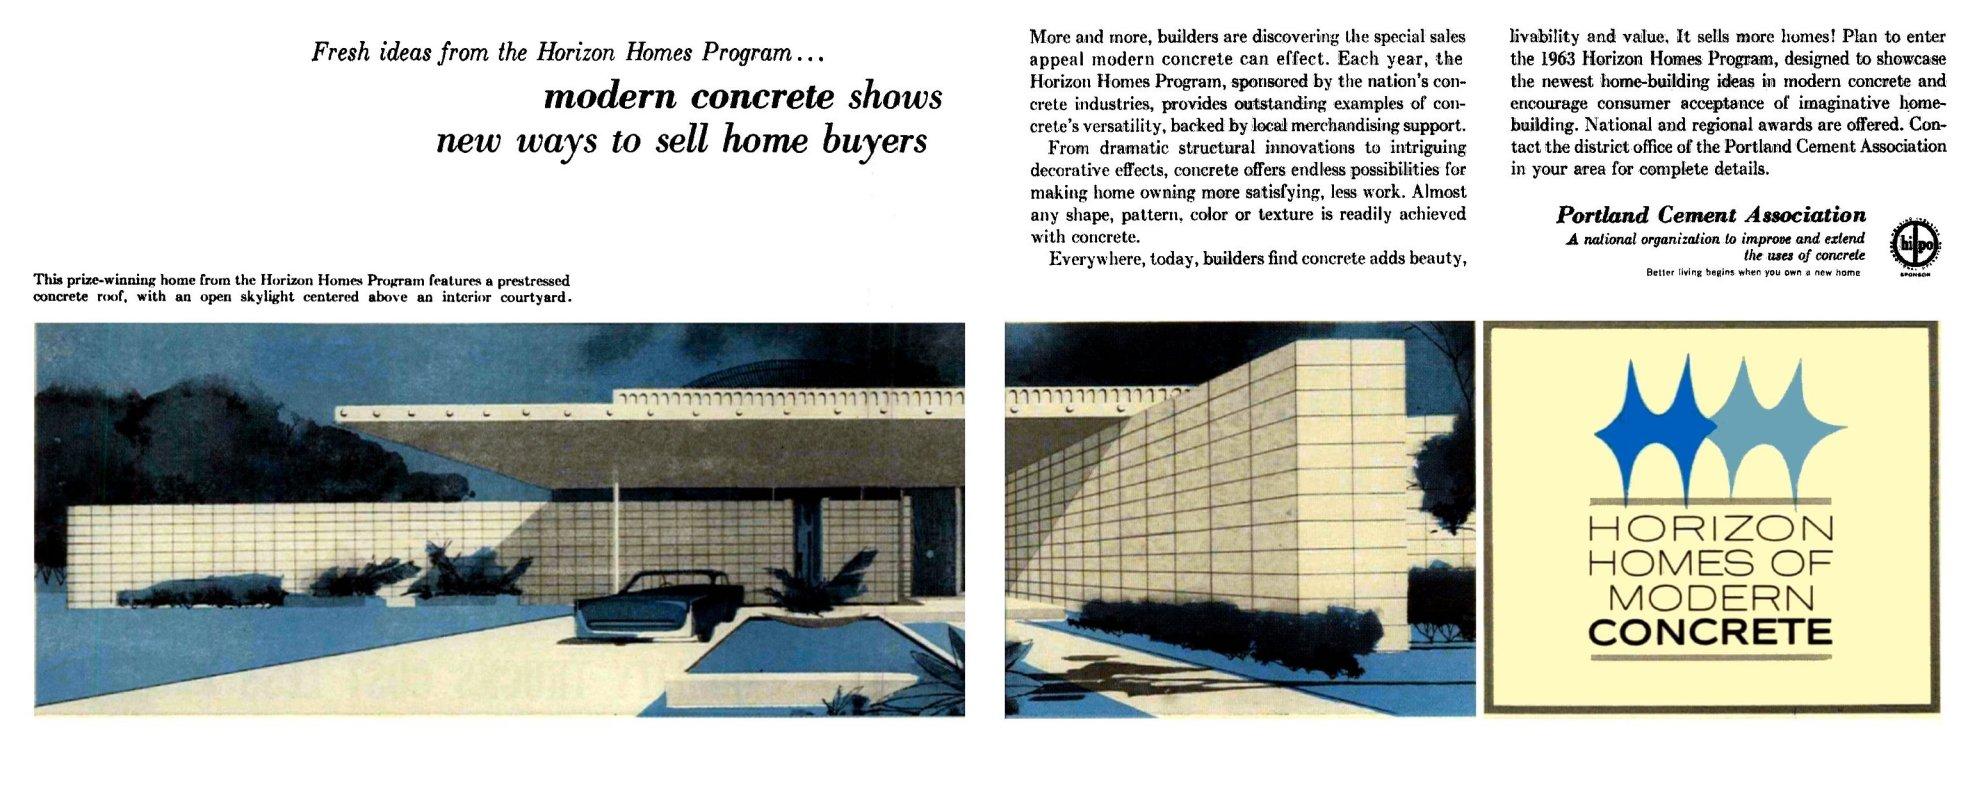 horizon-home-flyer-1963